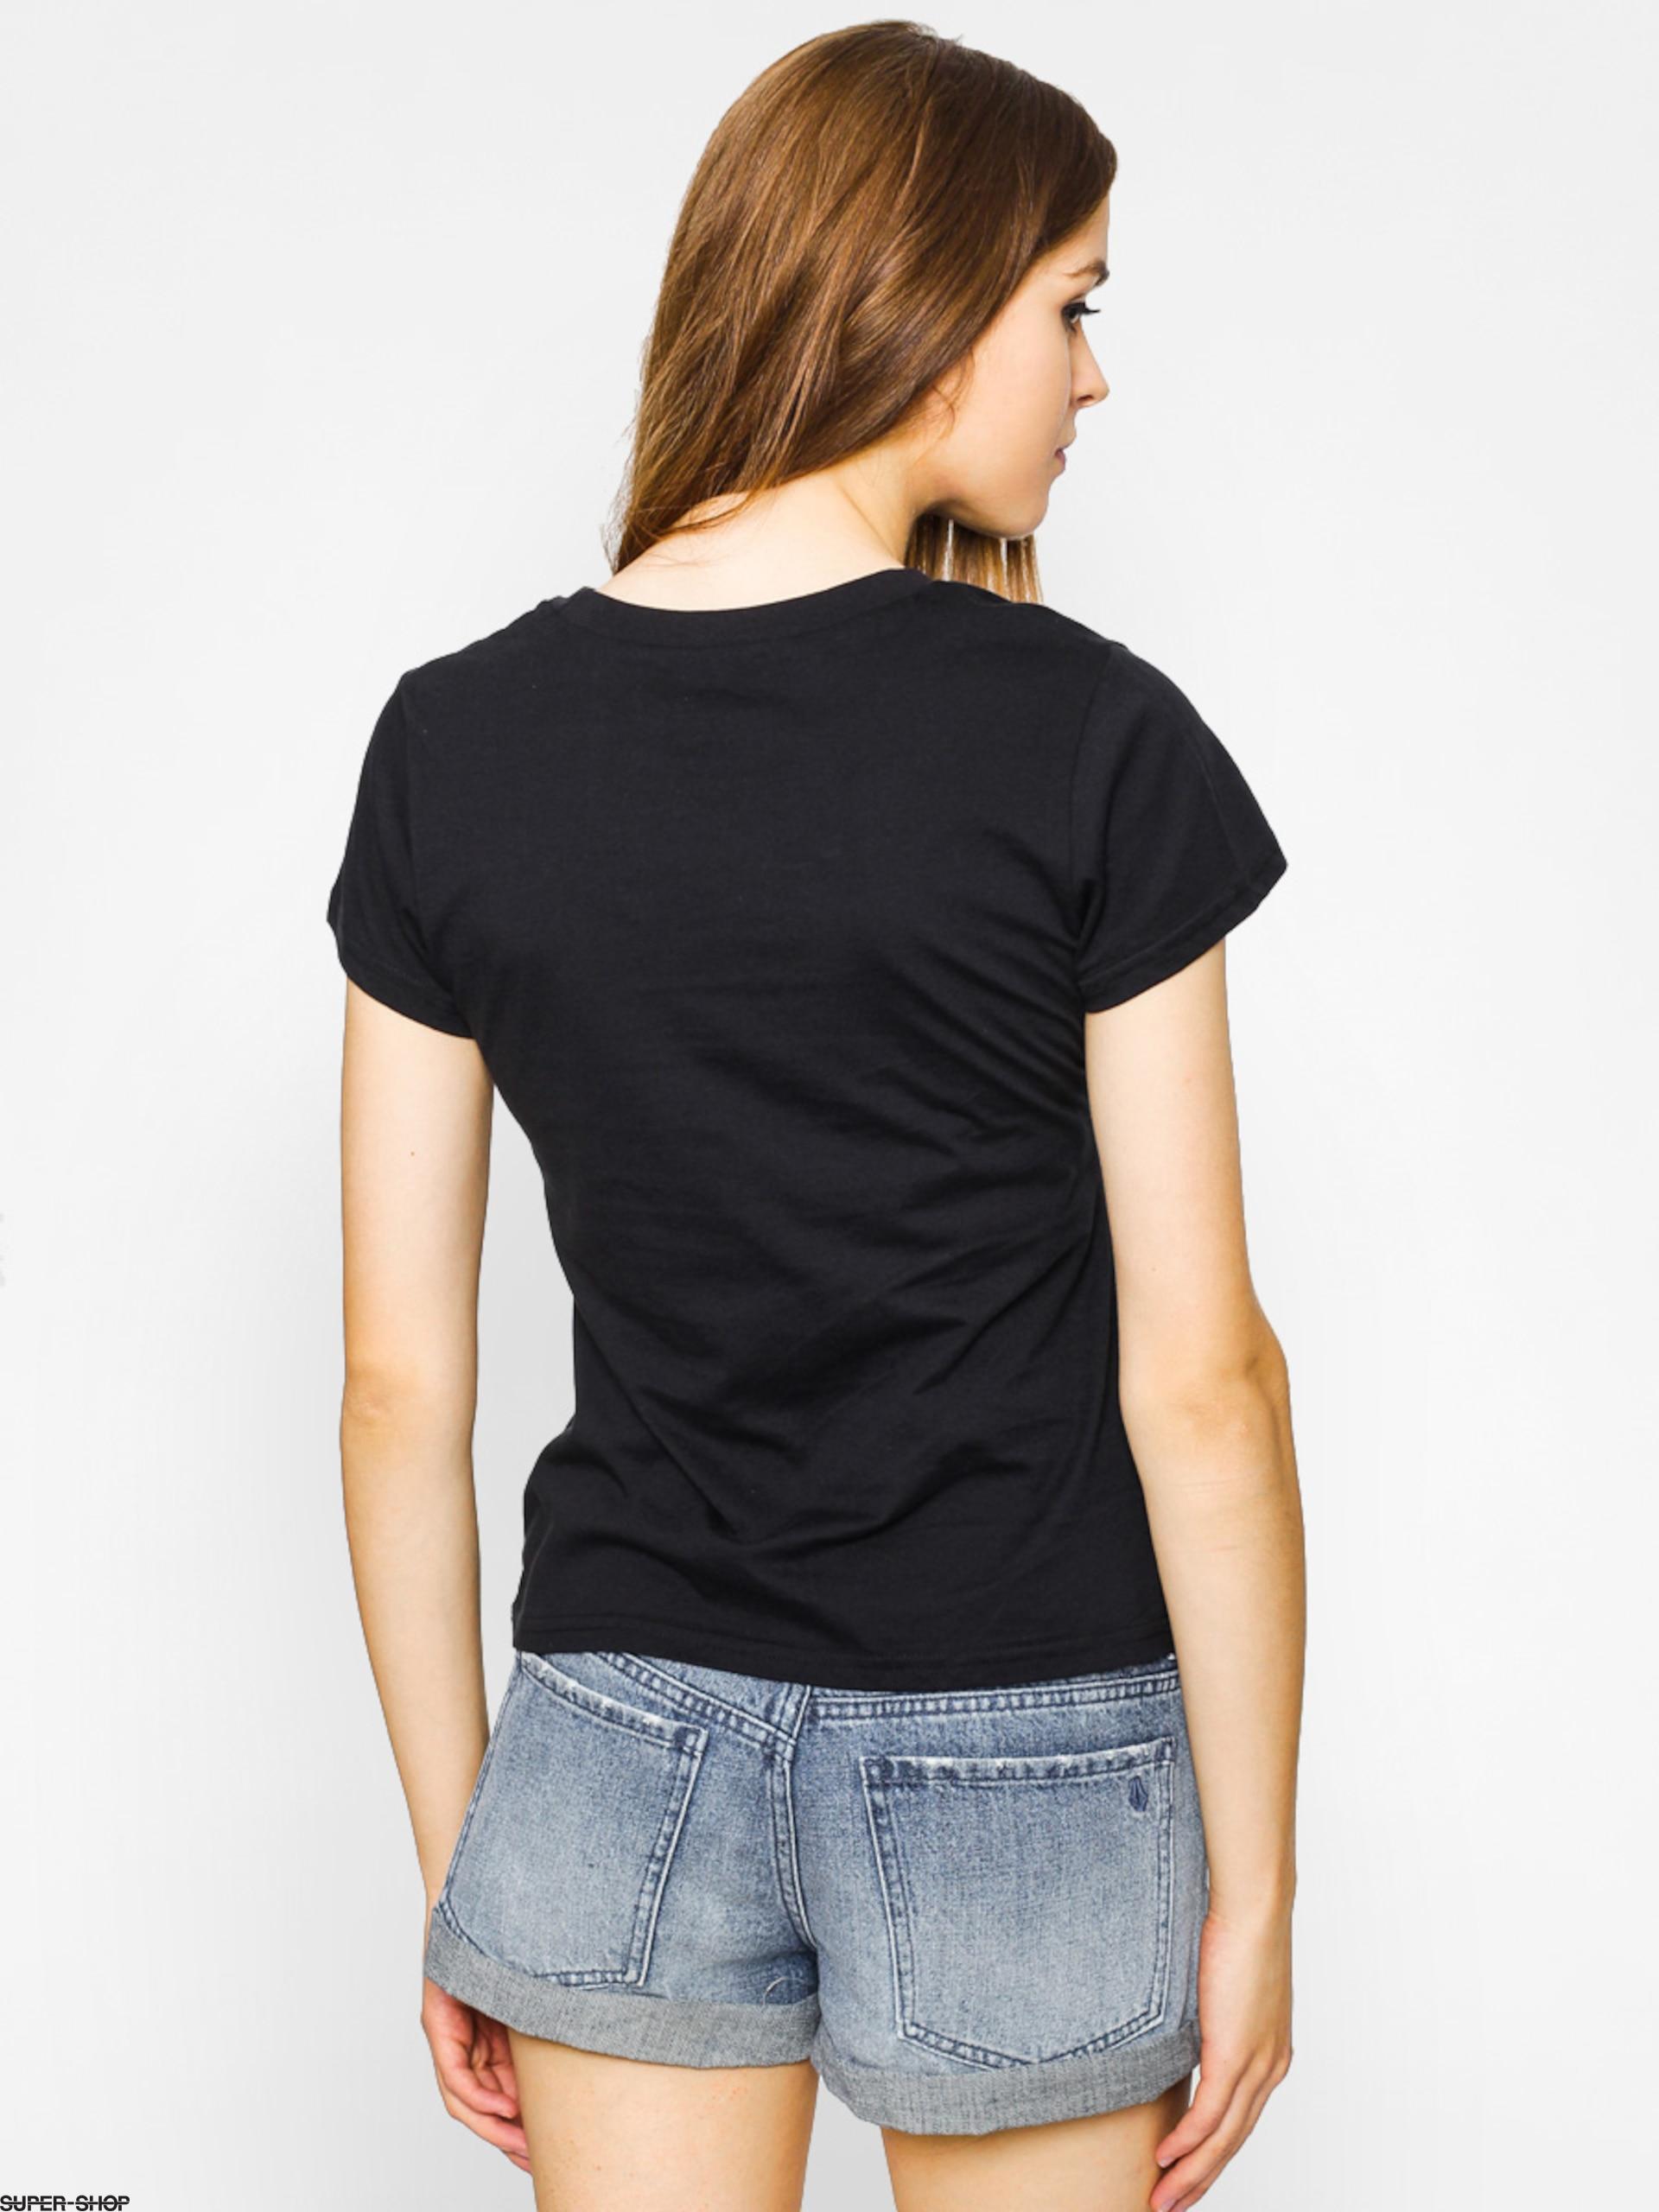 51e359efb5d Stussy T-shirt Wt Fade Baby Tee Wmn (black)